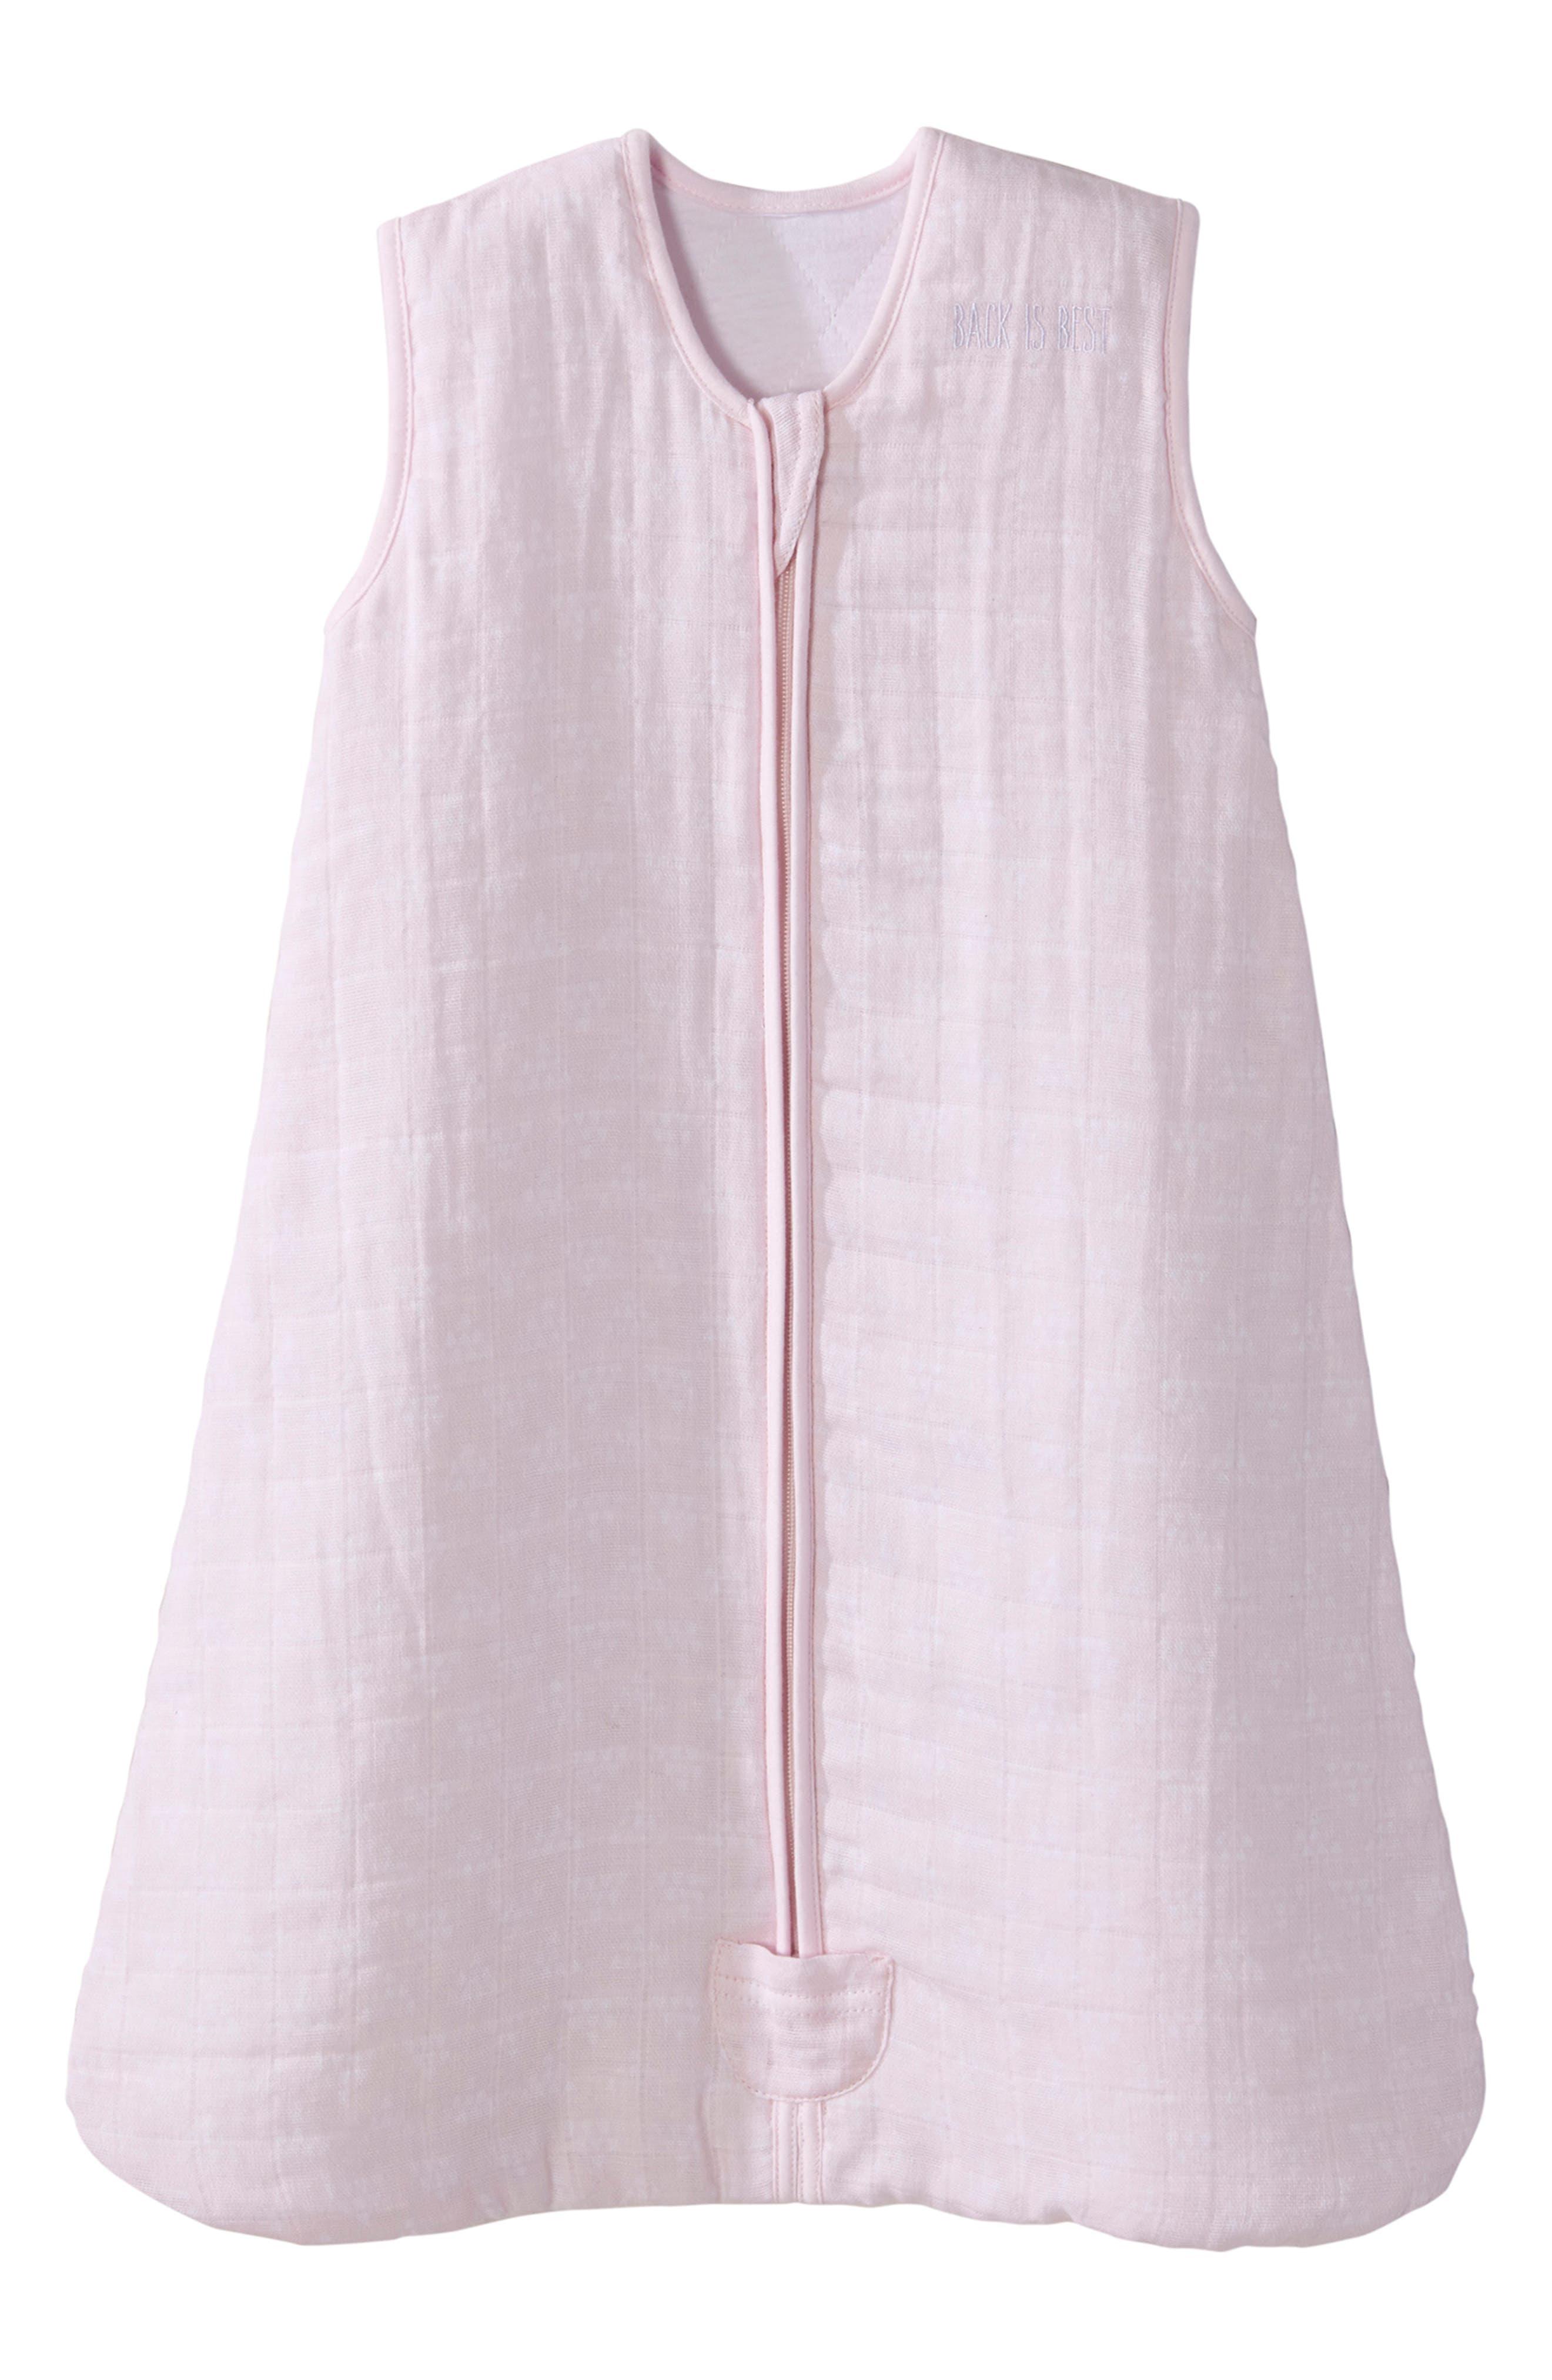 Halo Platinum Series Sleepsack(TM) Quilted Muslin Wearable Blanket Size 612M  Pink